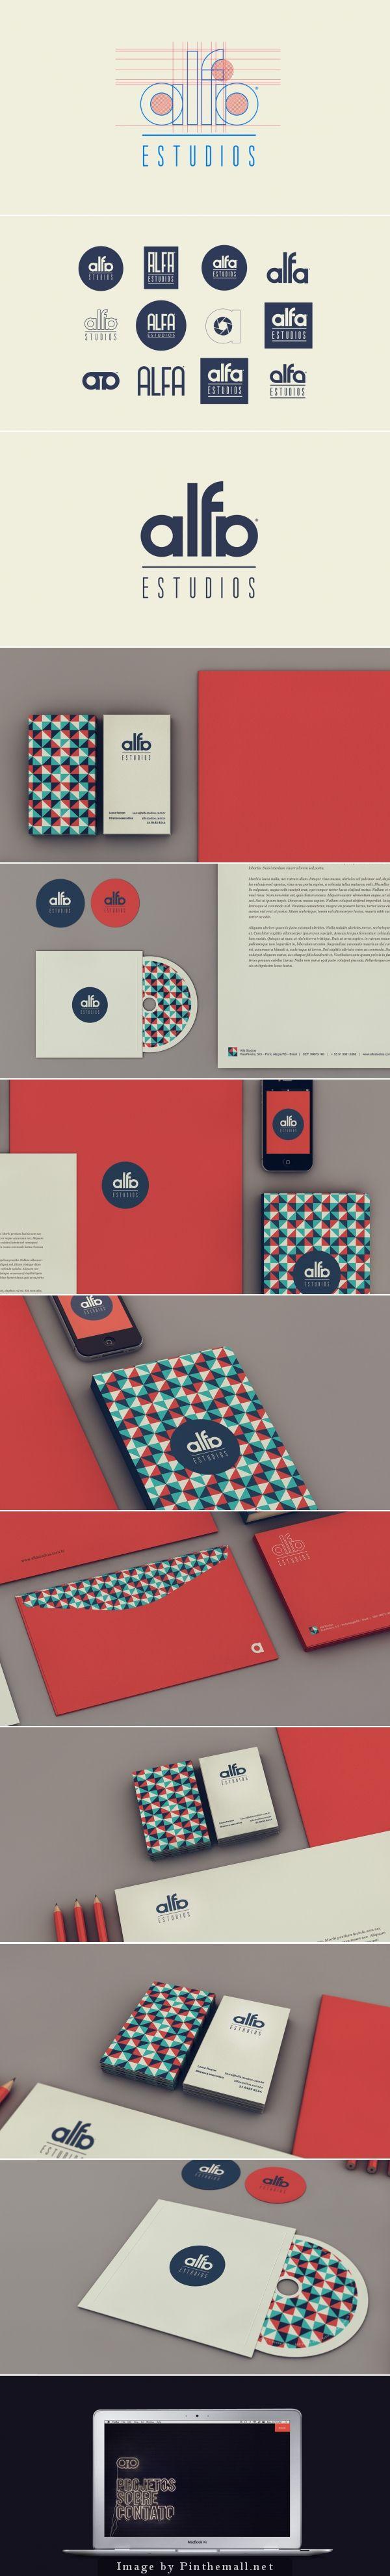 Alfa Studios by Isabela Rodrigues